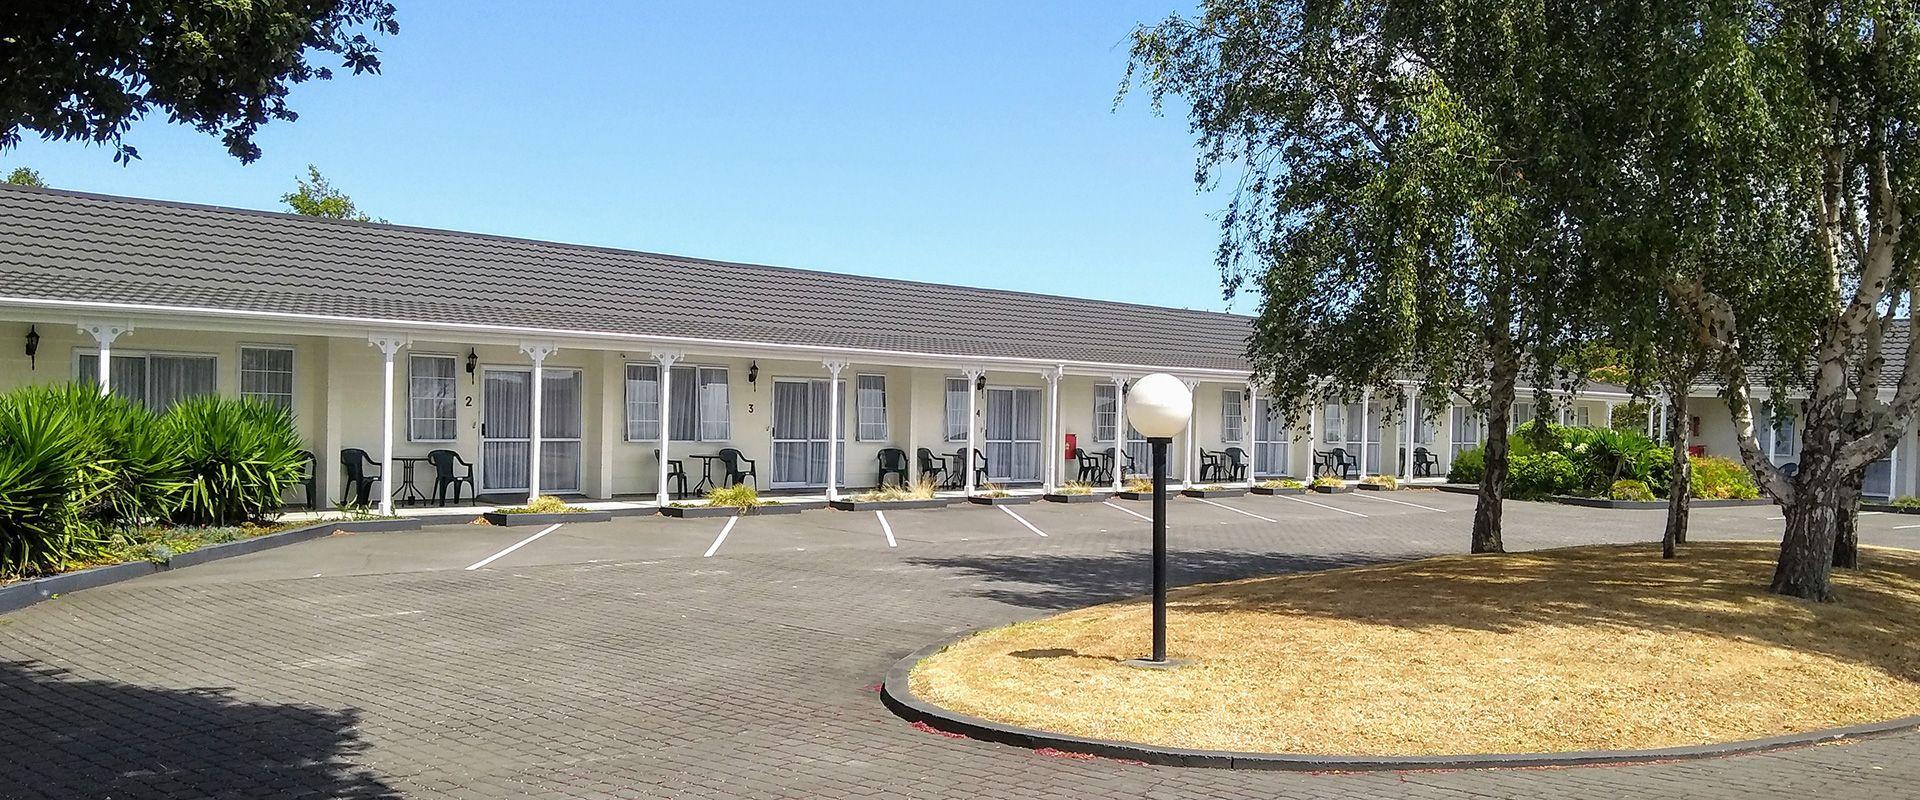 Whanganui accommodation